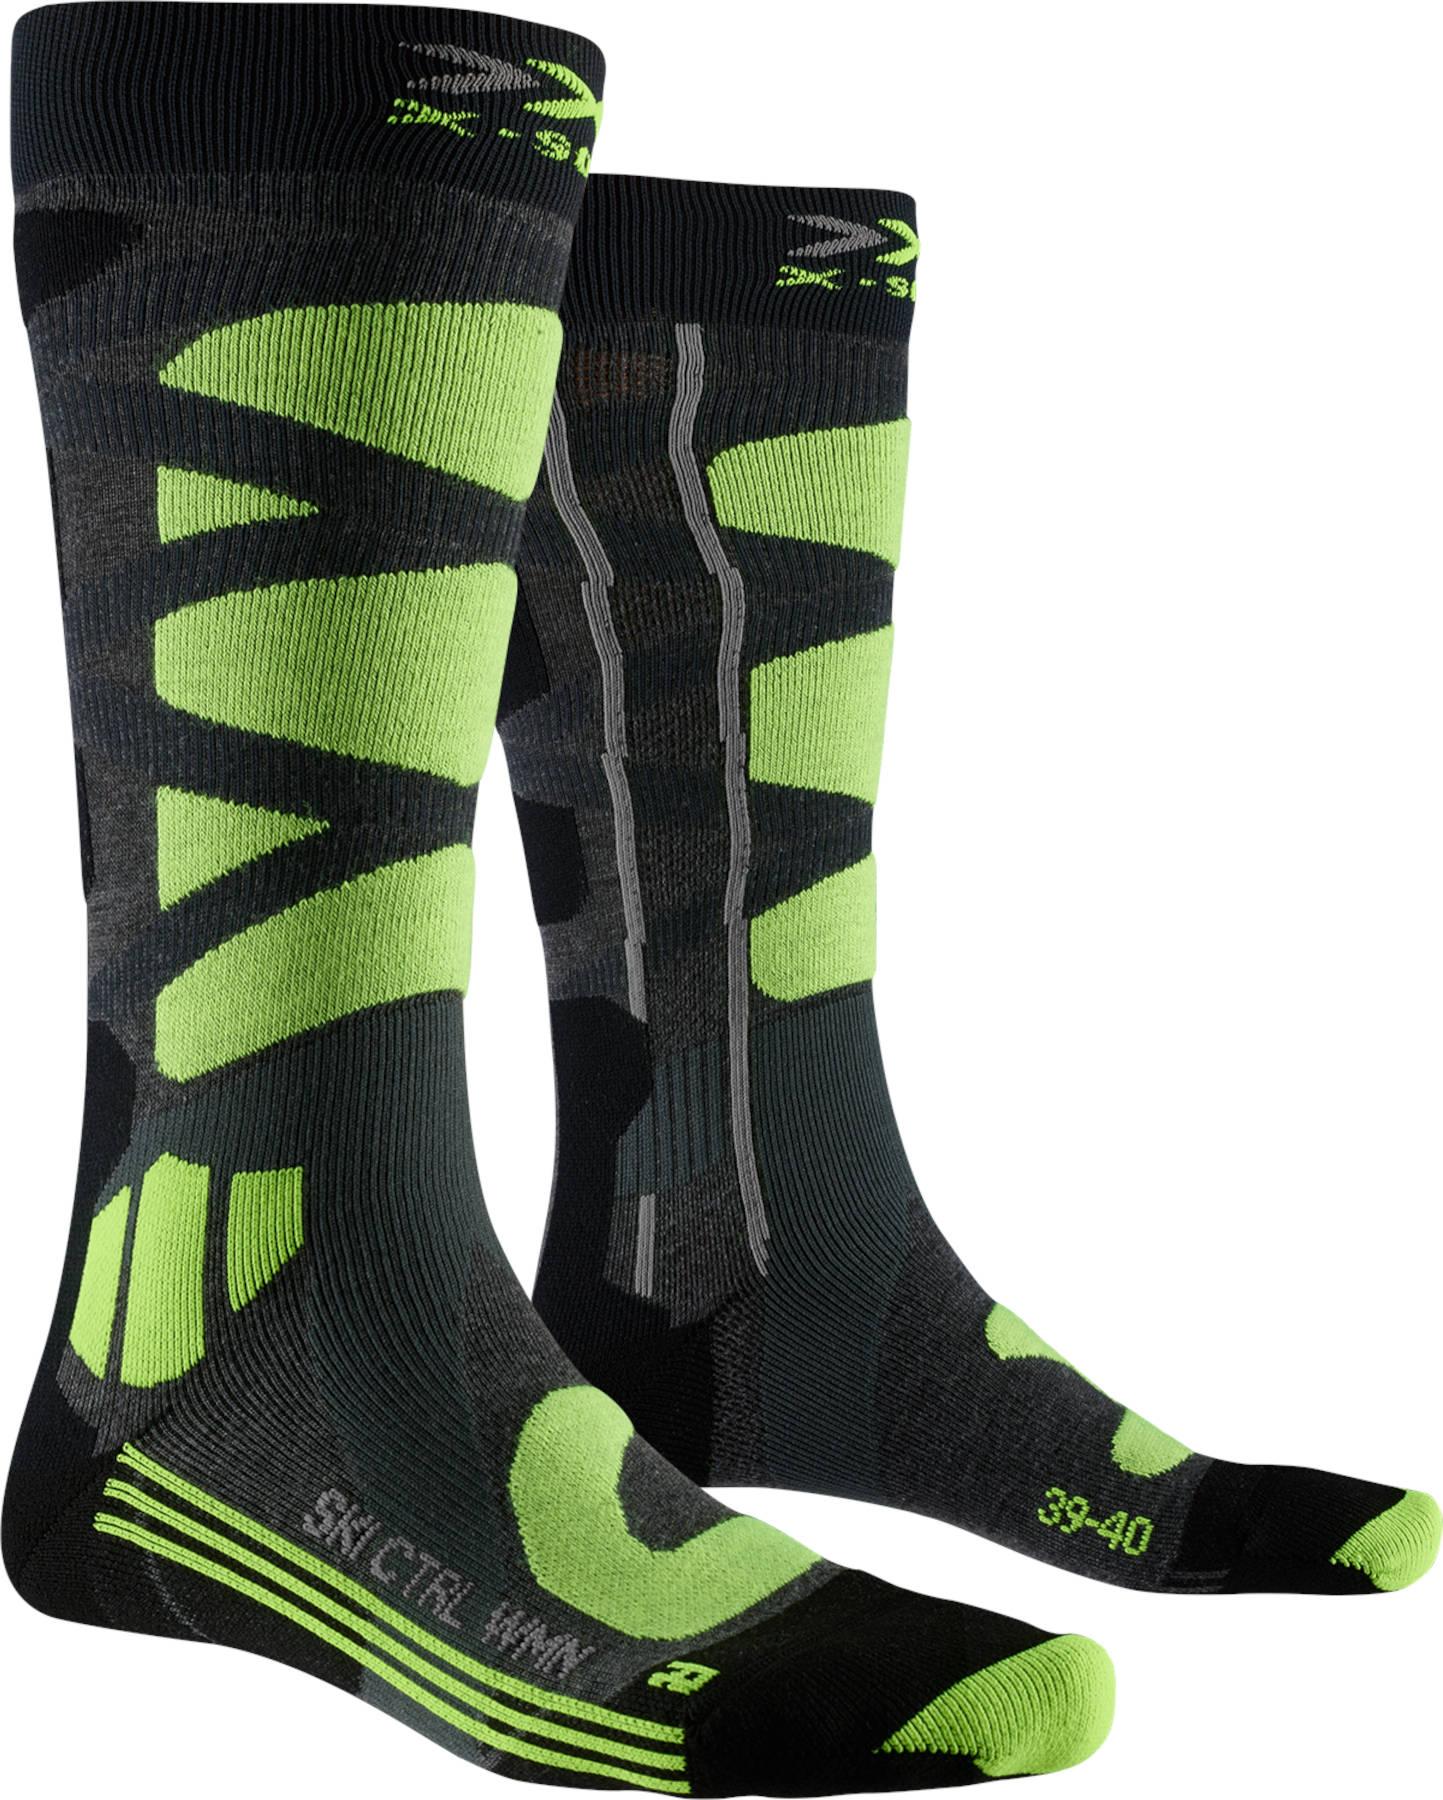 X-Socks Ski Control 4.0 Socks for Women - mid grey melange/phyton yellow